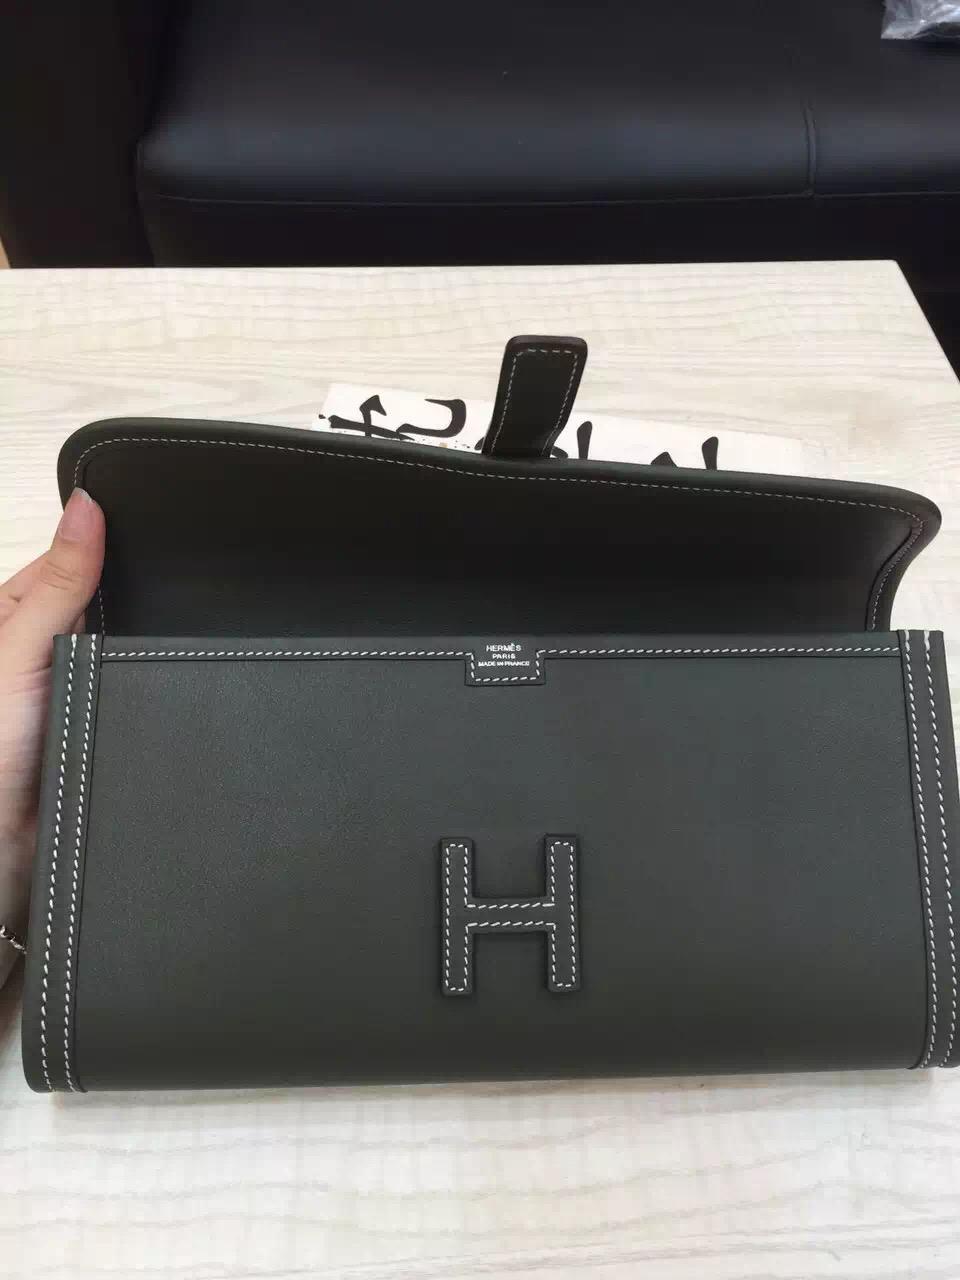 Discount Hermes Jige Elan Wallet V6 Canopee Green Swift Leather